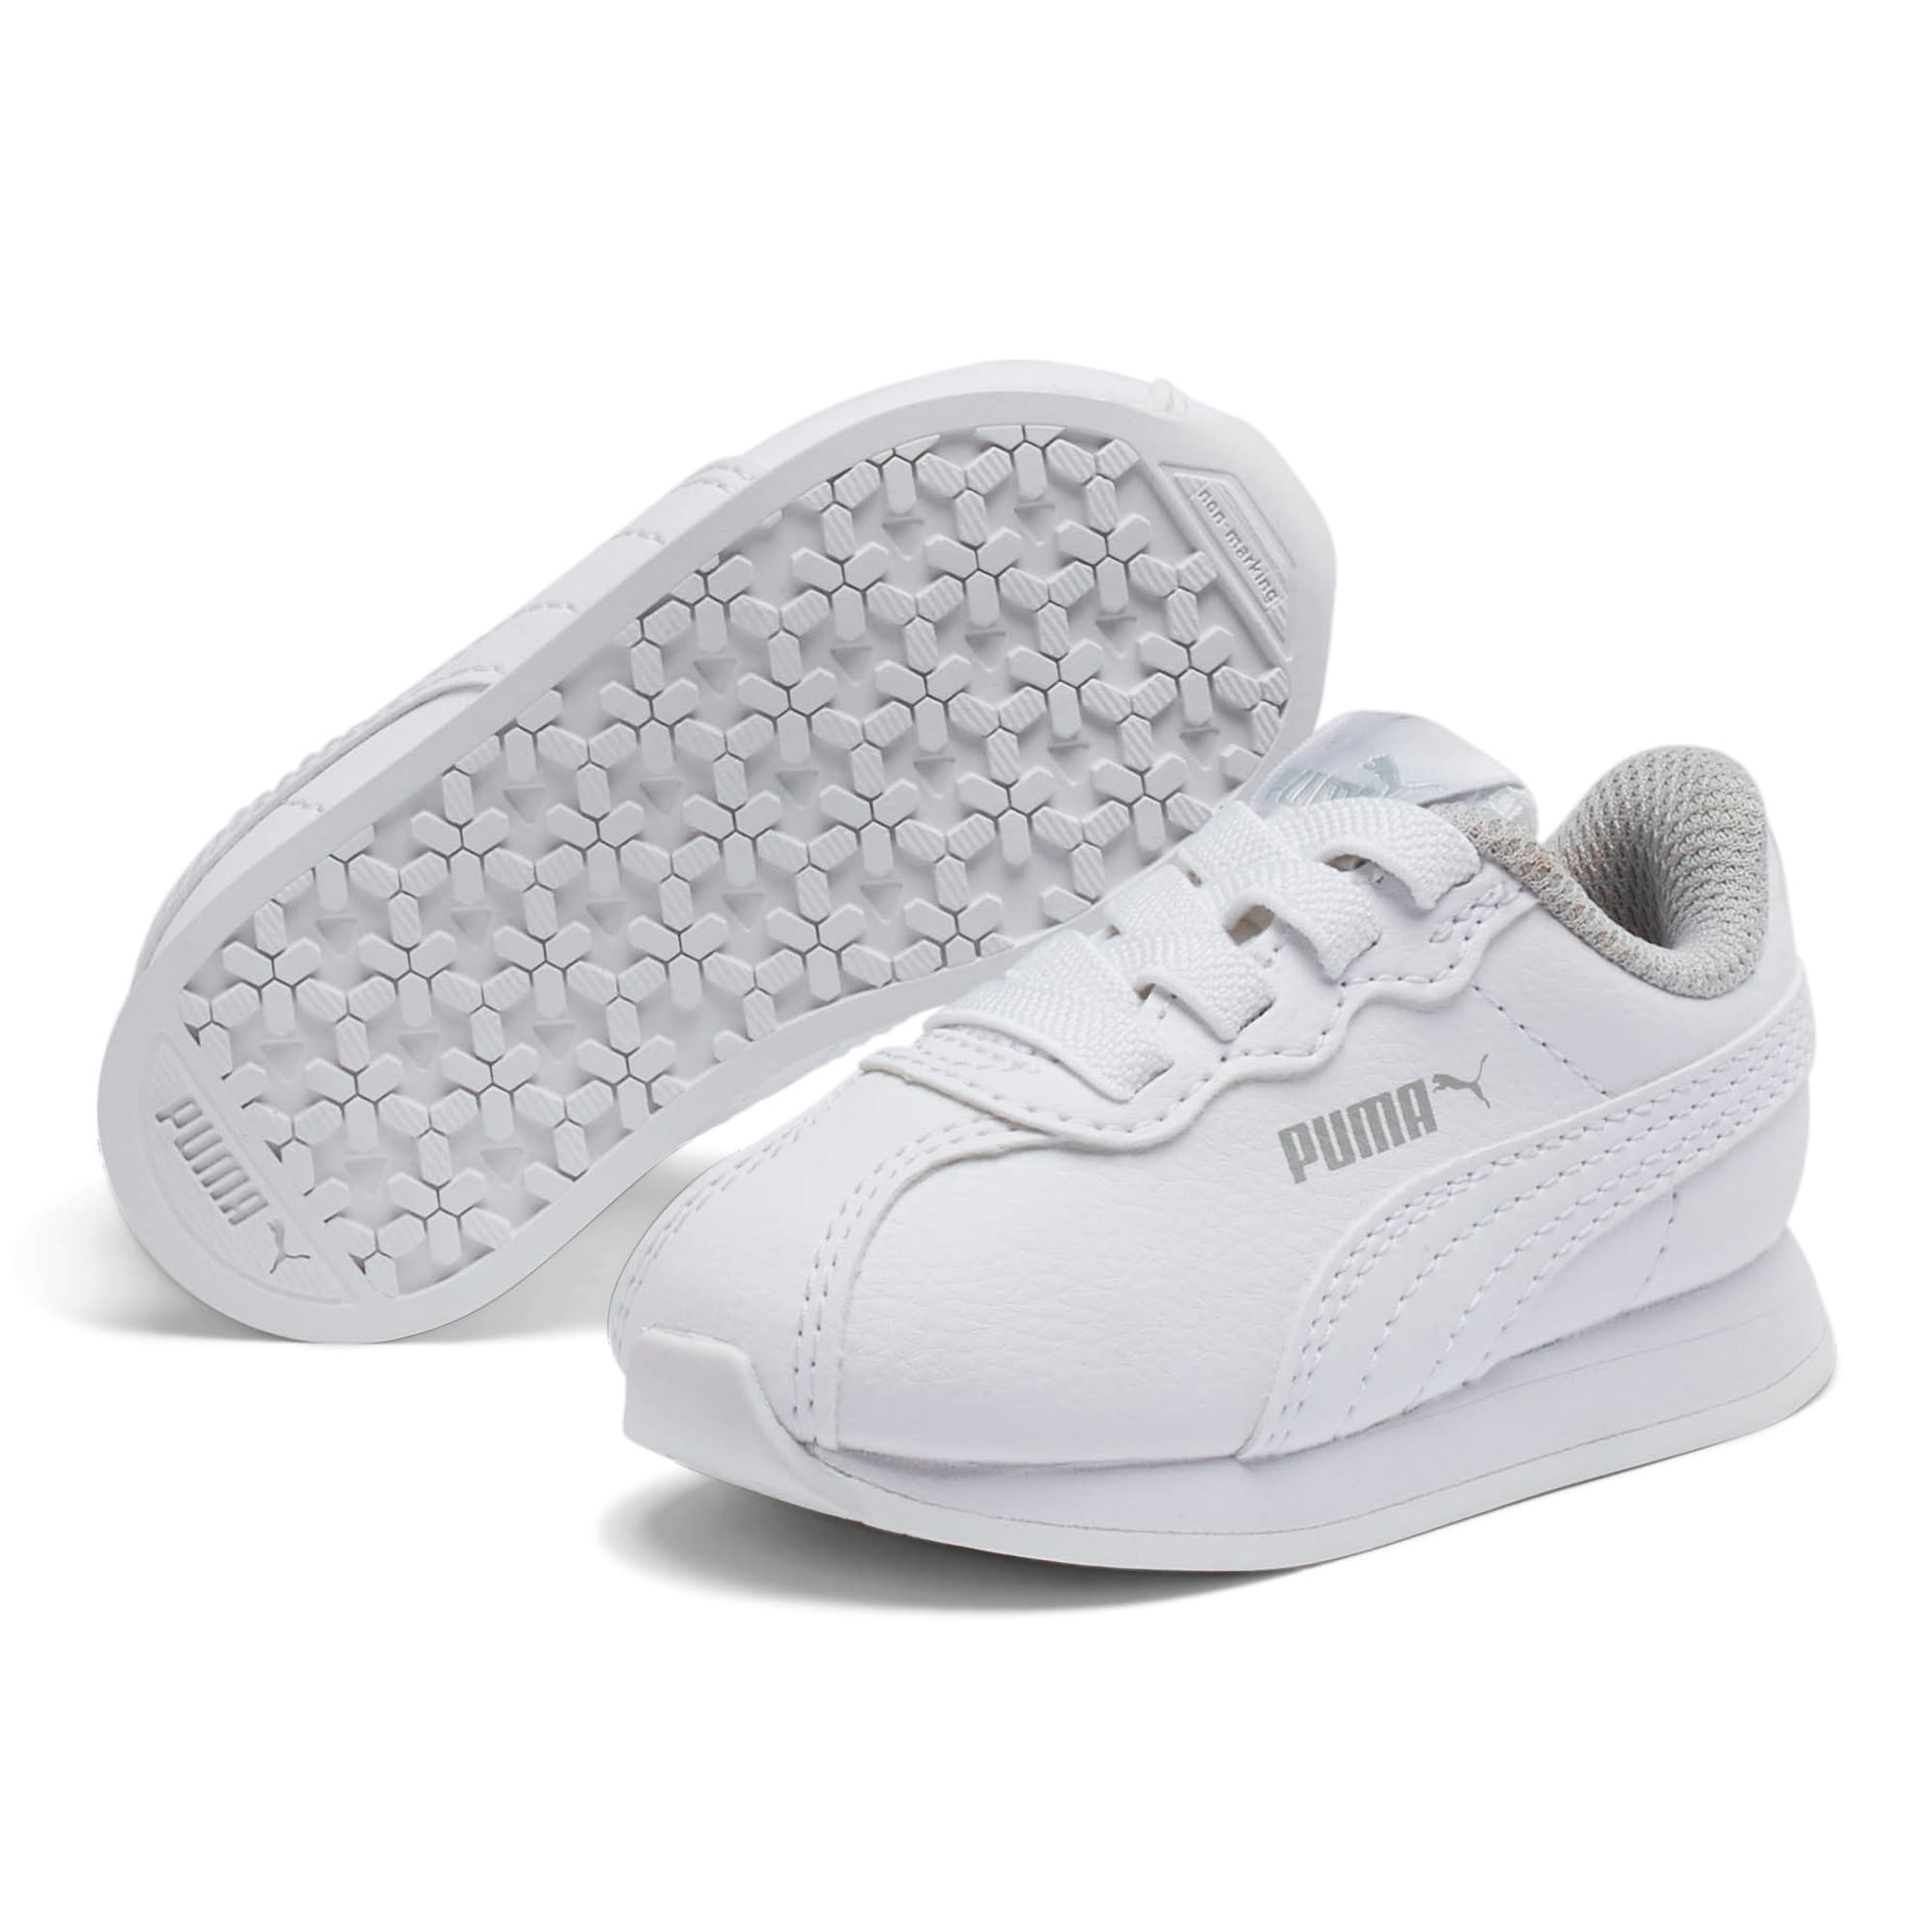 Thumbnail 2 of Turin II AC Toddler Shoes, Puma White-Puma White, medium